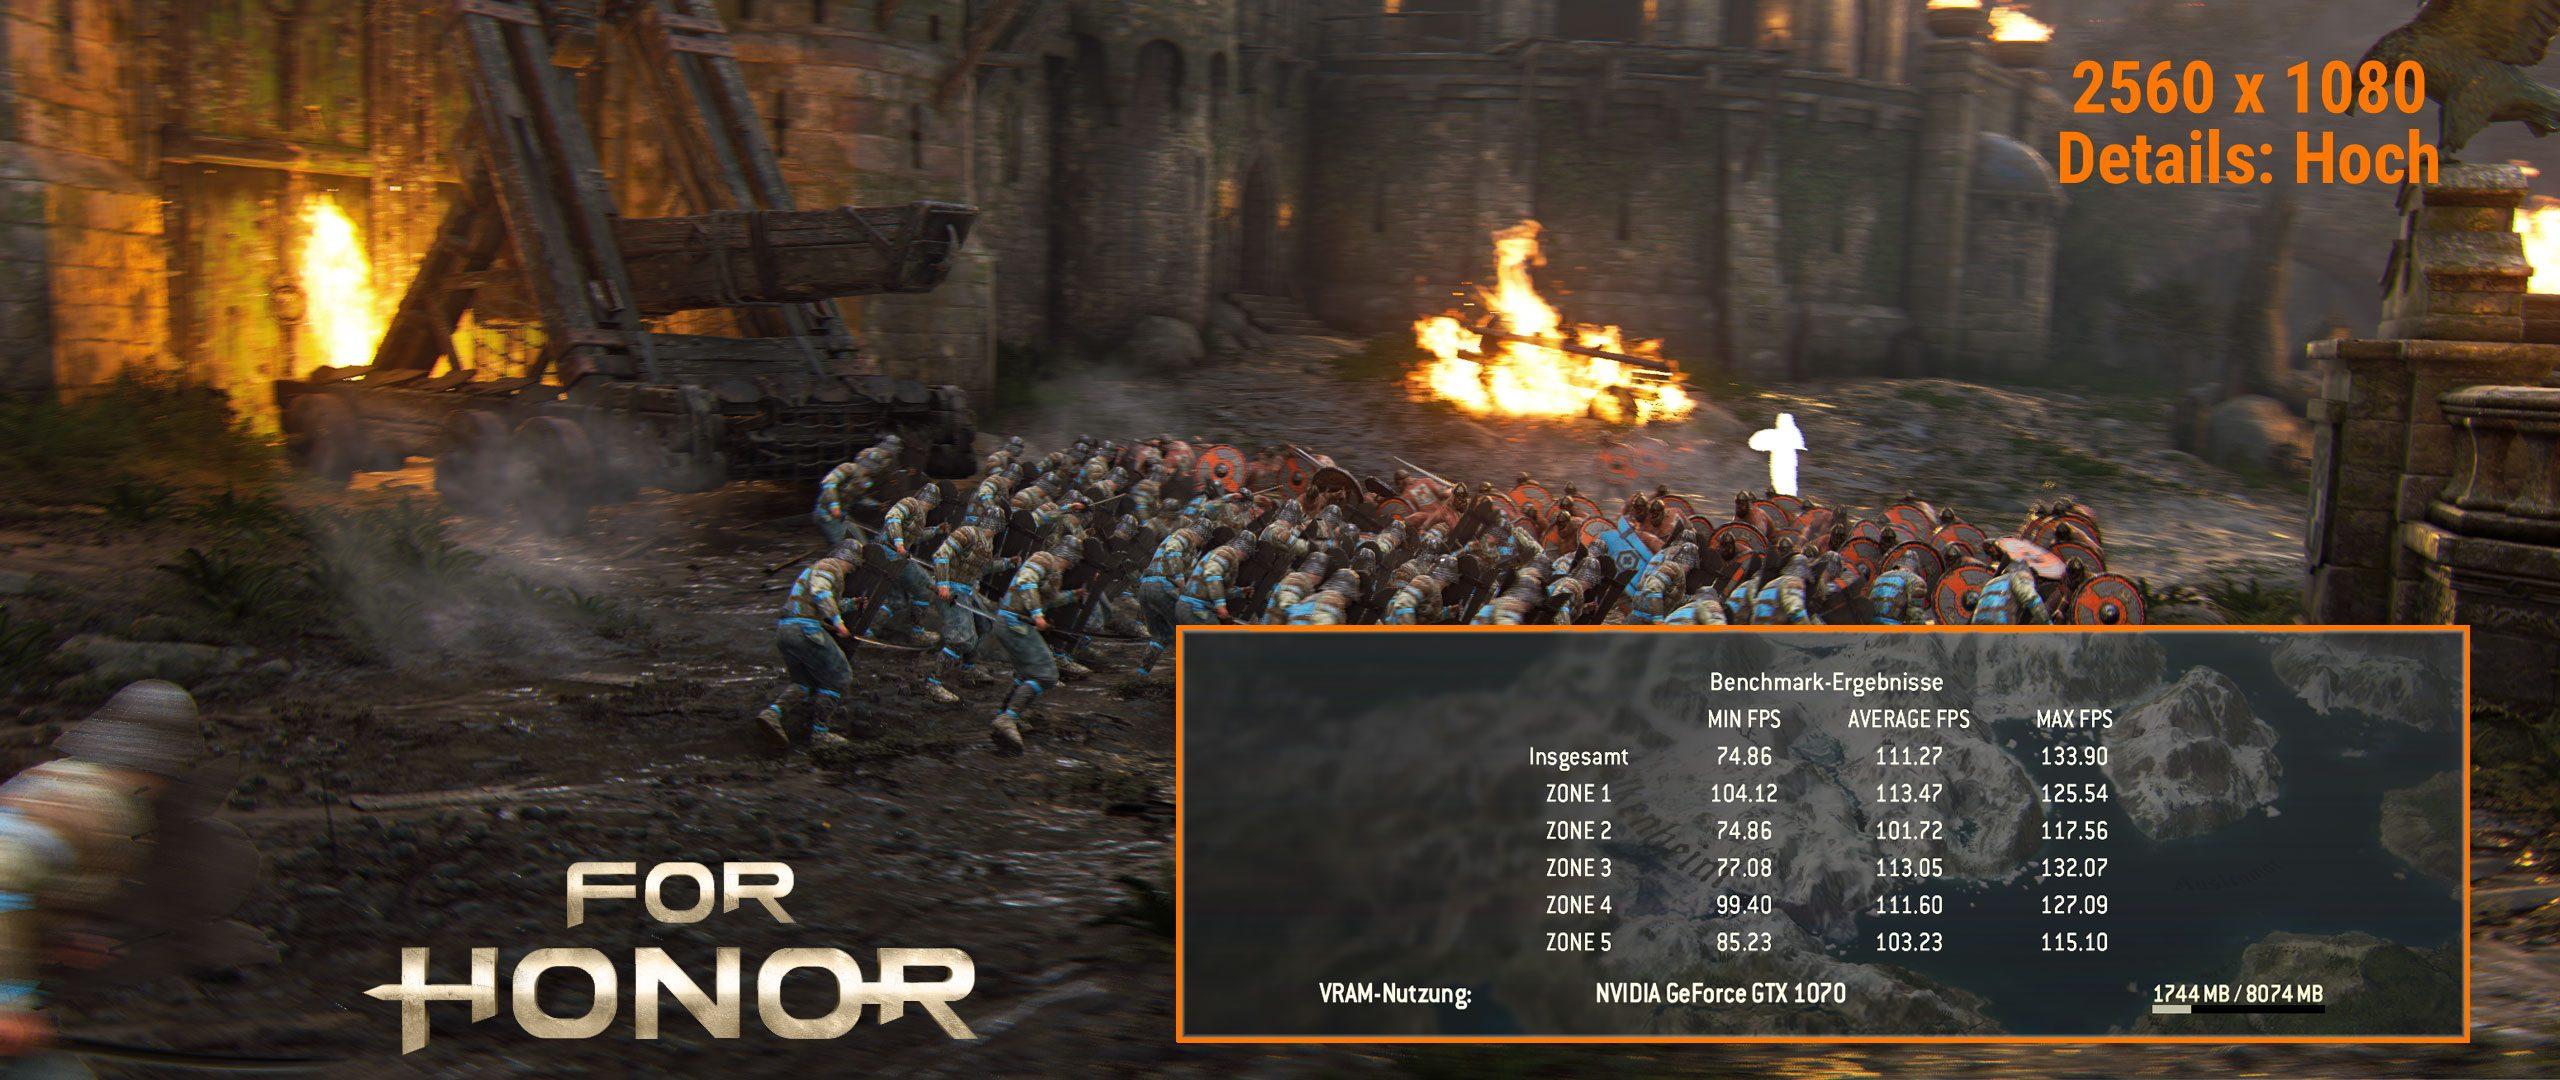 Medion-Erazer-X7857_Games-Monitor-6